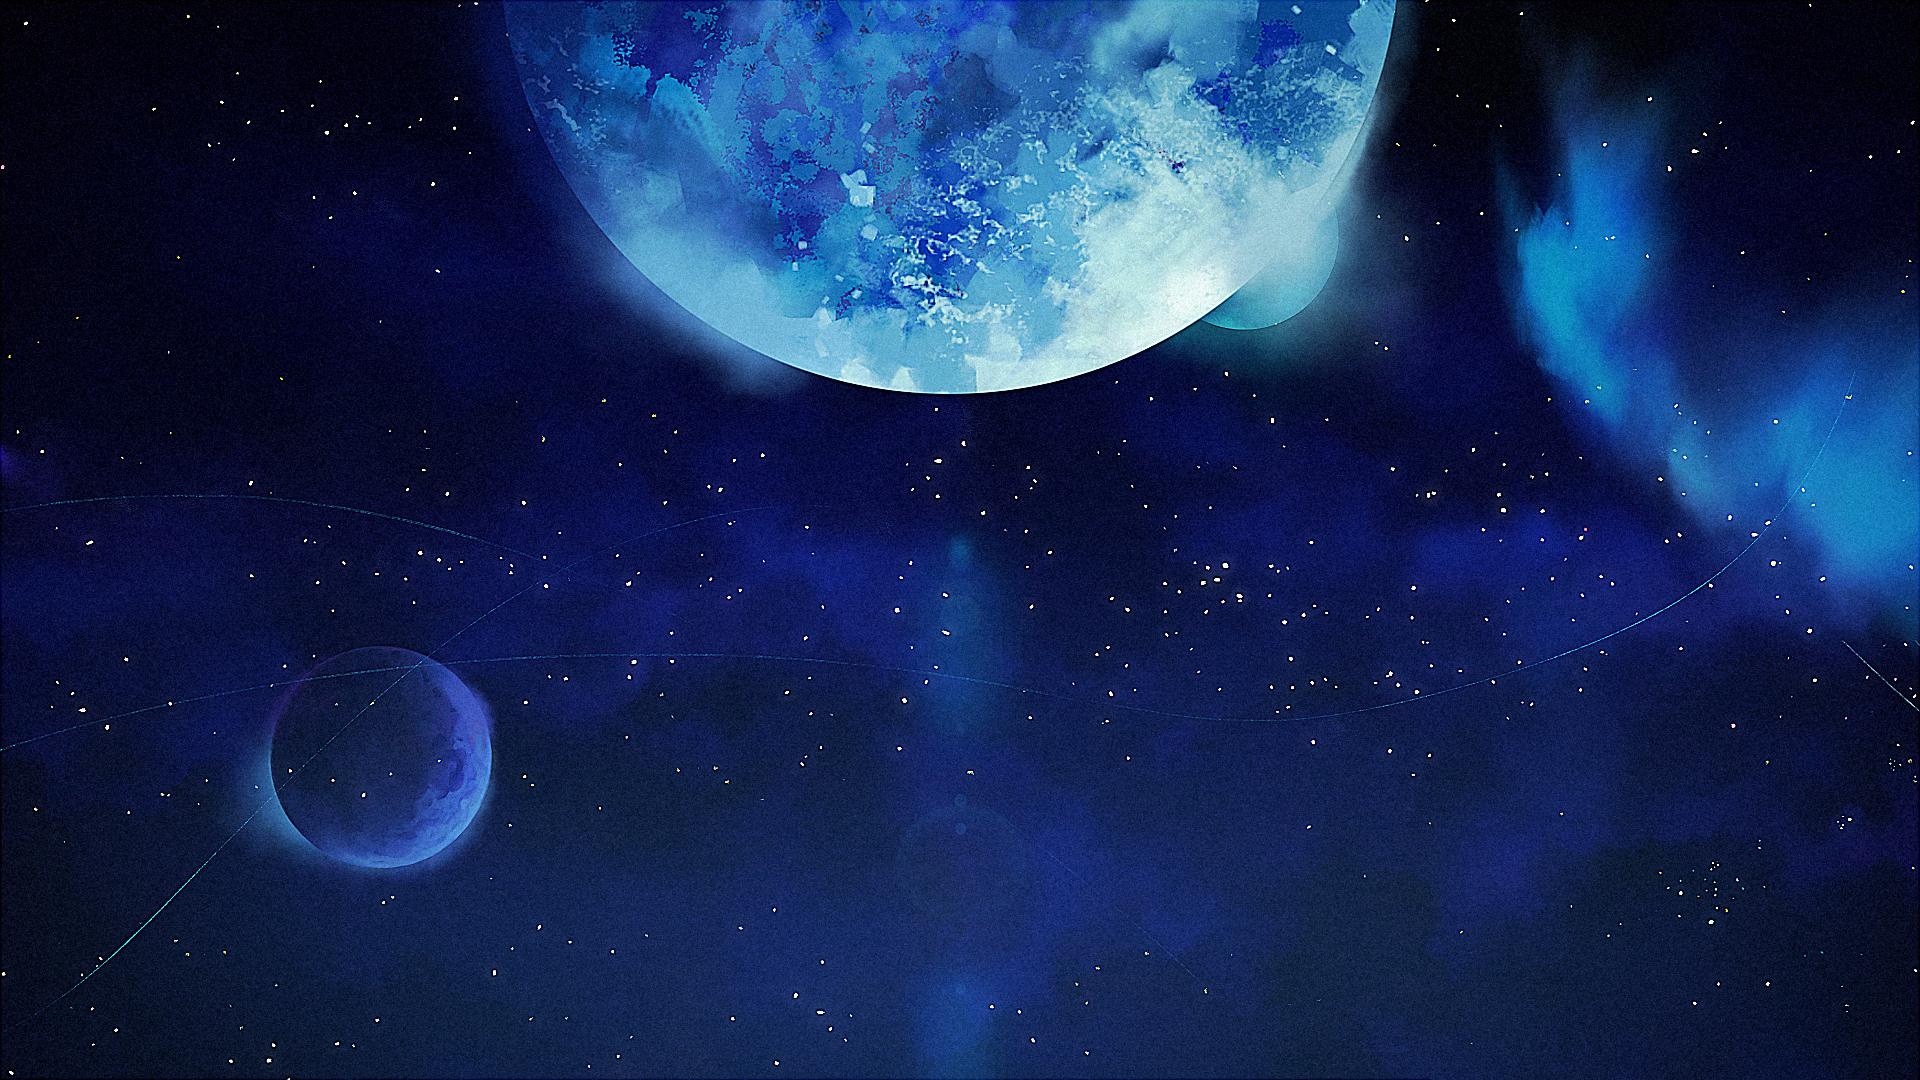 constellation_opening_racoonstudio_cosimomiorelli_animation_8